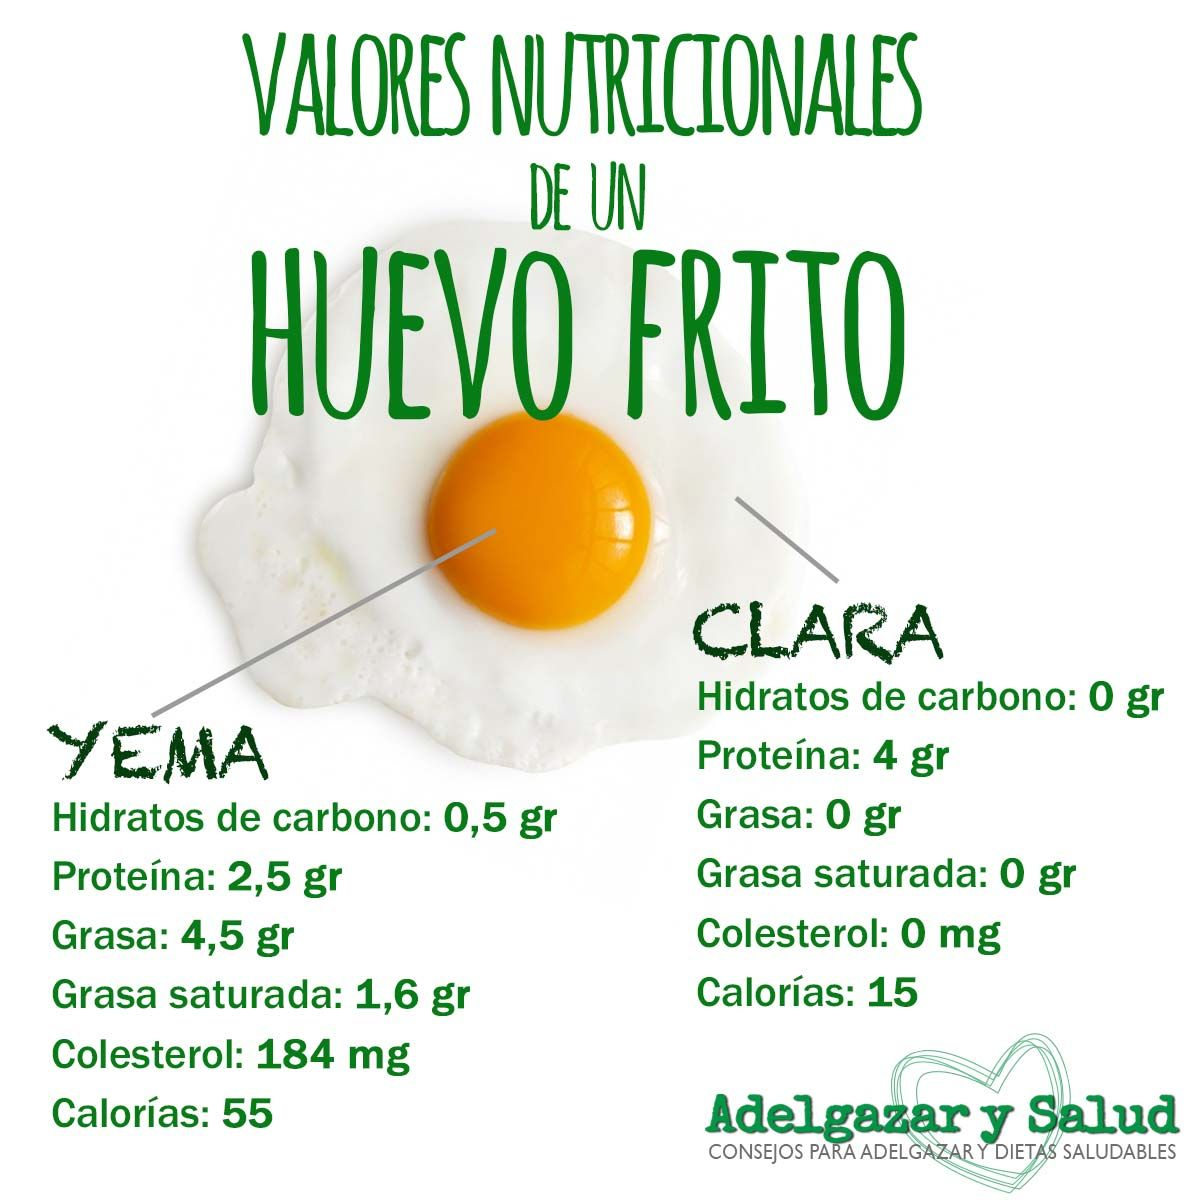 Huevo Calorías Adelgazar Nutrición High Protein Vegetables School Nutrition Healthy Cooking